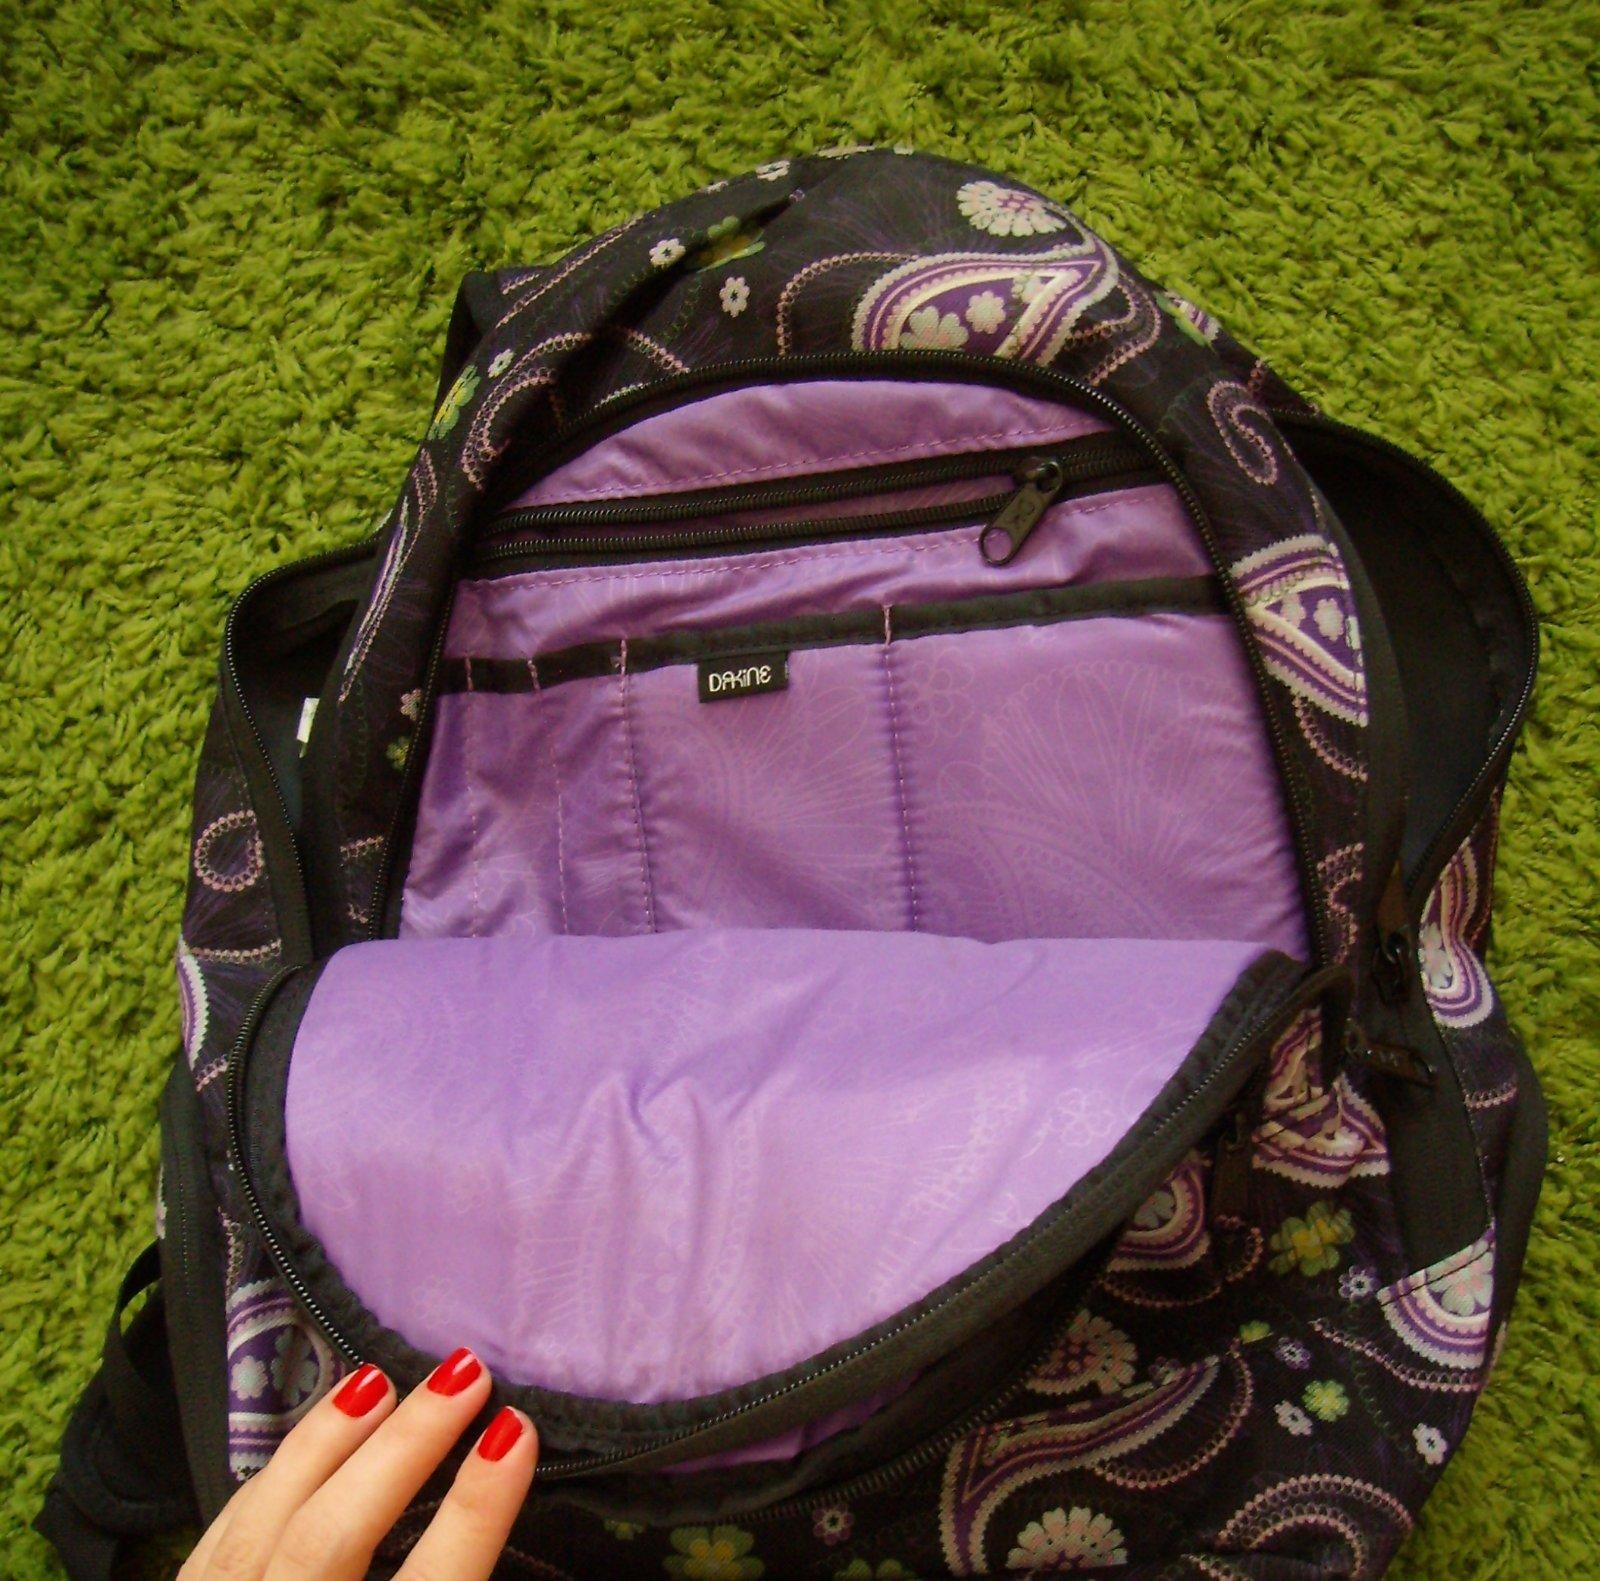 10365b2fc8 Zobraz celé podmienky. Ruksak resp. školská taška (fialová) ...